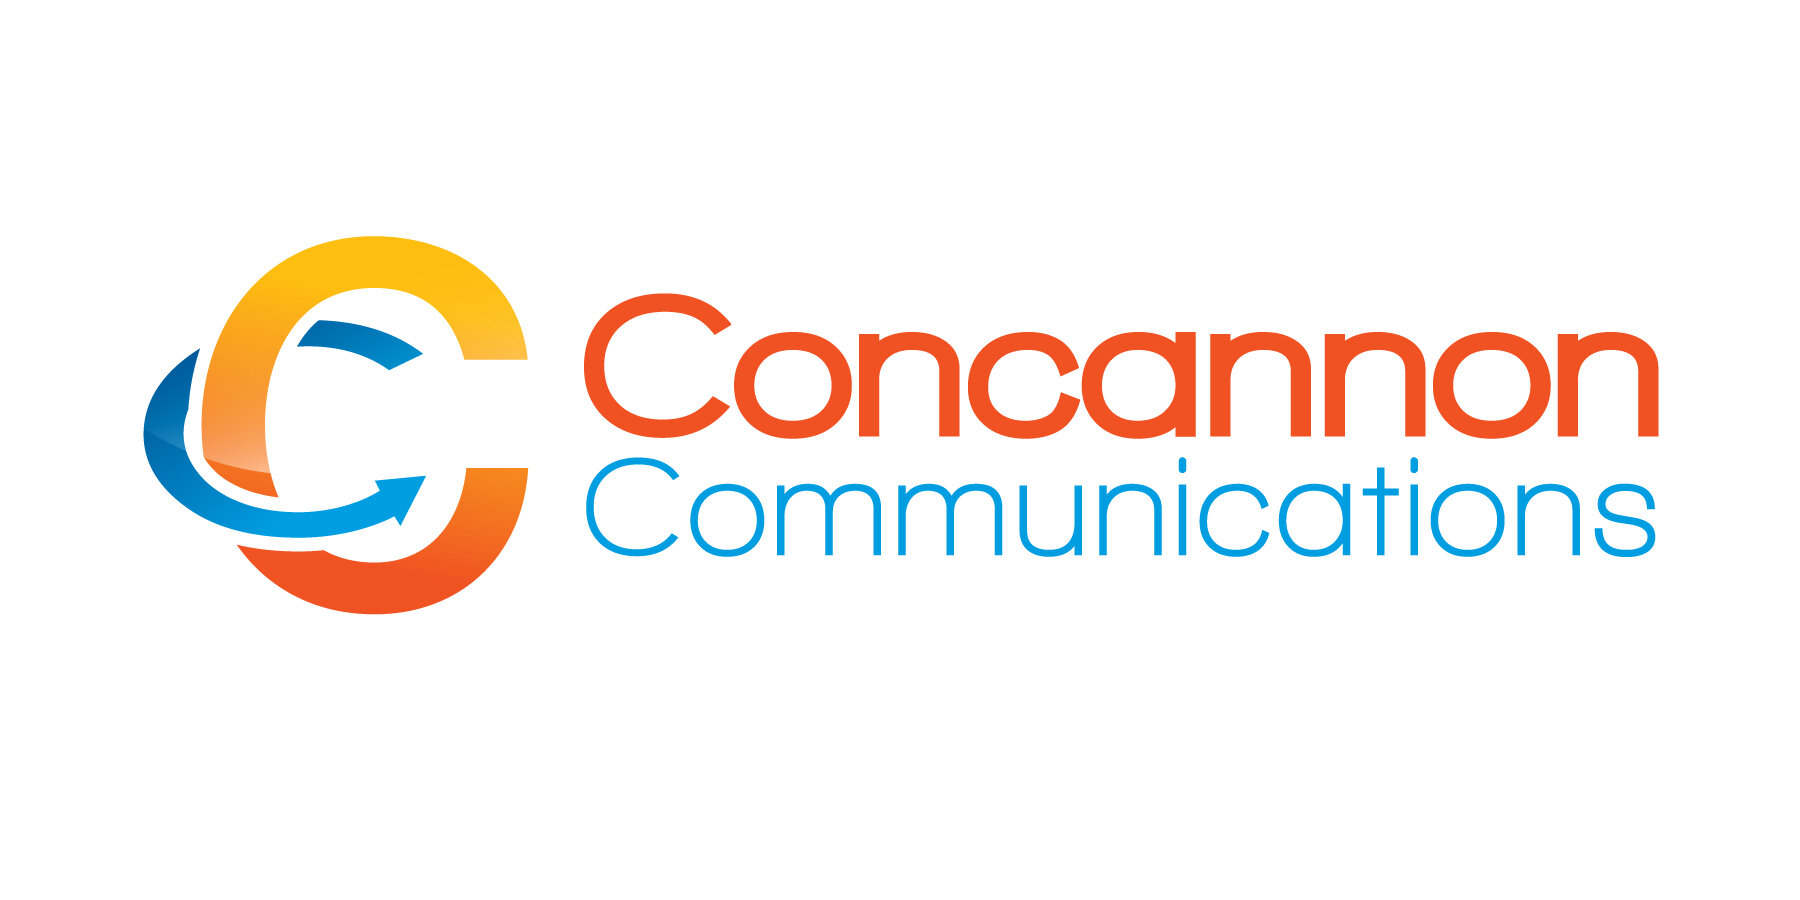 Concannon Communications_pack.jpg